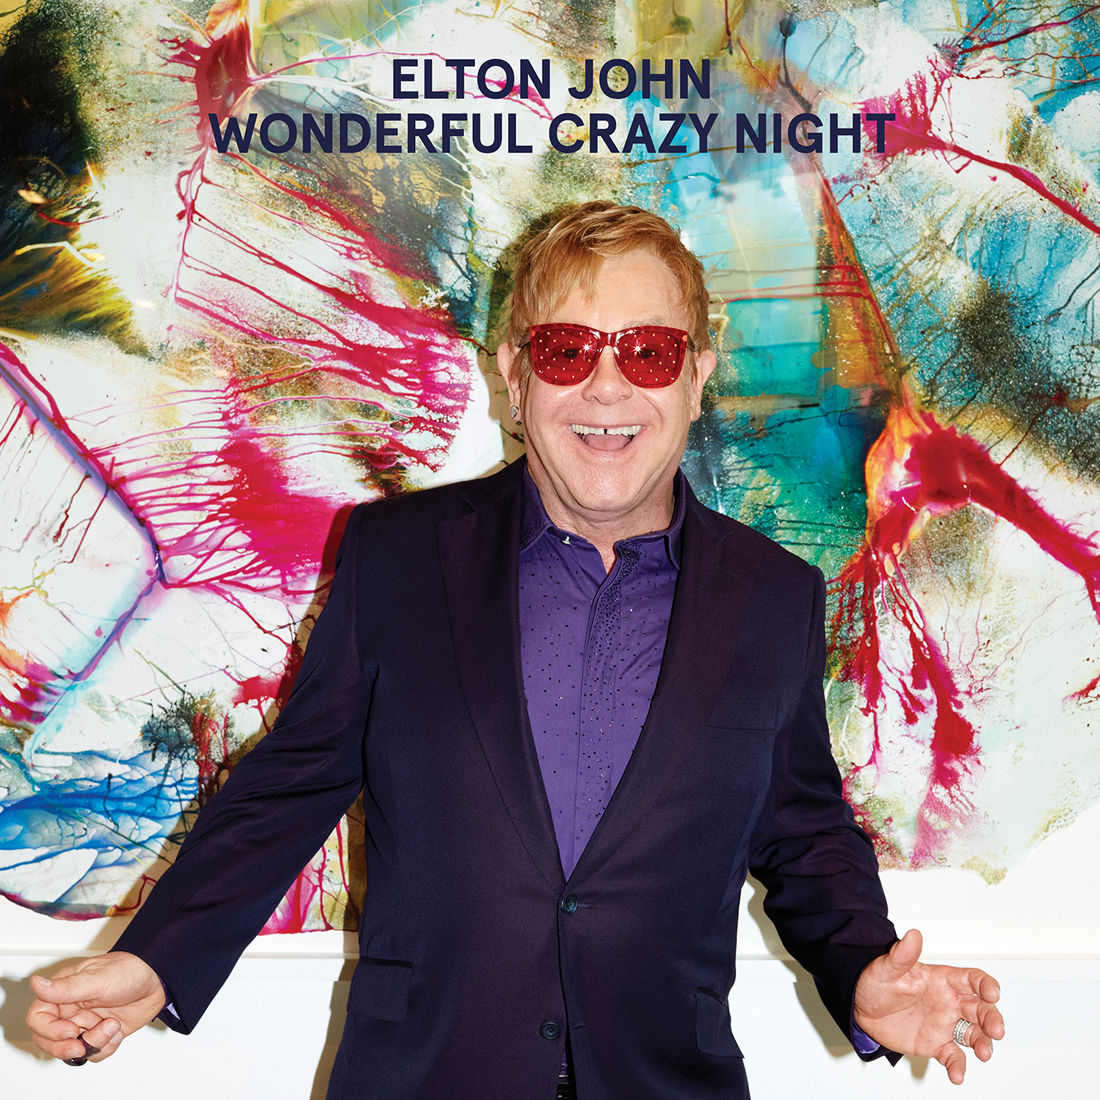 Elton John: Wonderful Crazy Night Album Deluxe CD